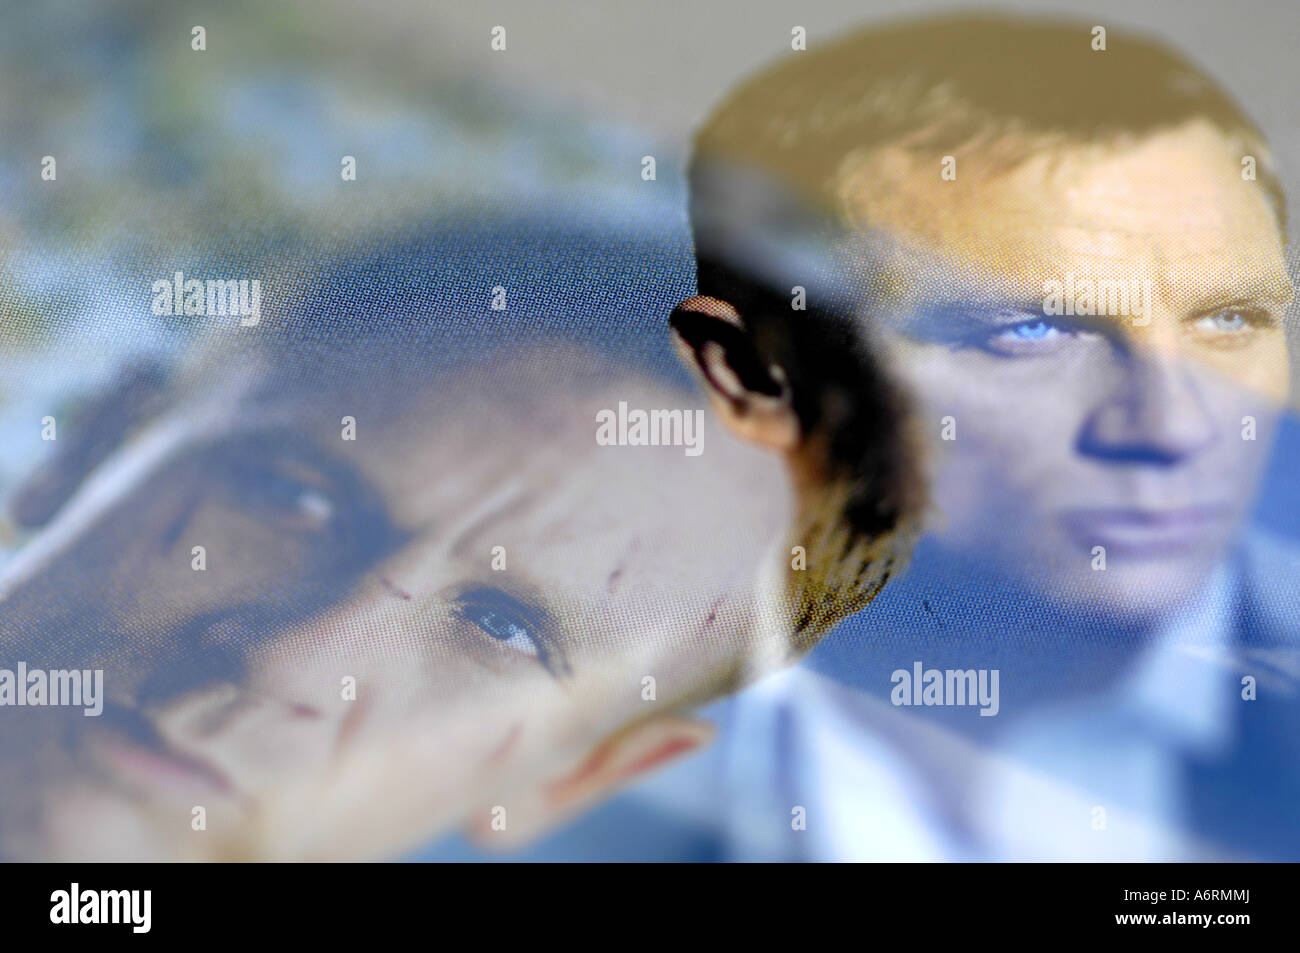 daniel craig james bond composite digital actor ian flemings oo7 007 spy assassin british secret service man male - Stock Image